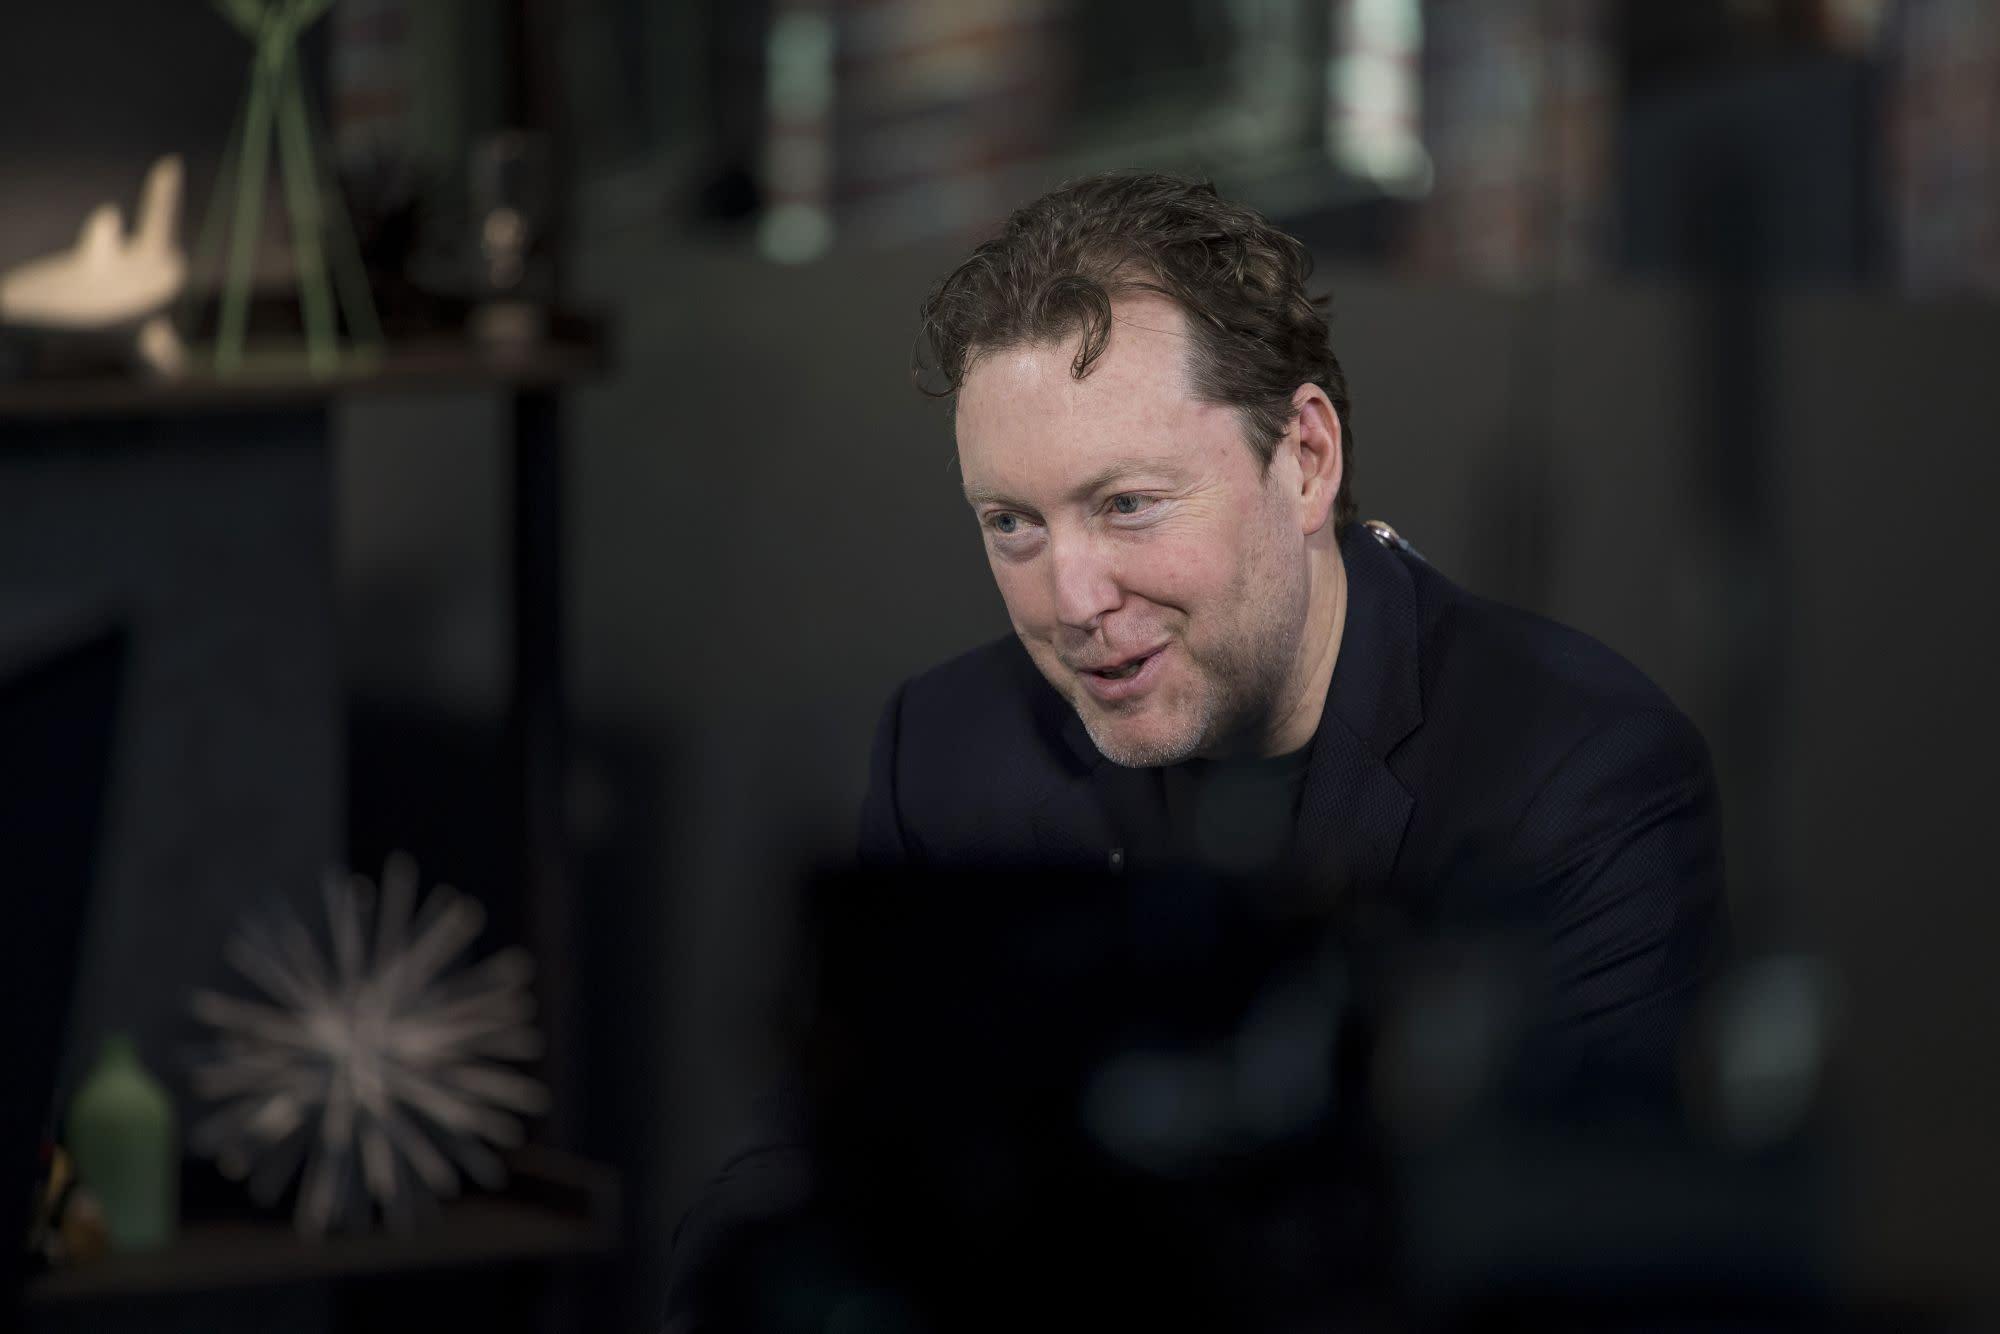 Ex-SoFi CEO to Start Blank-Check Company to Raise $250 Million